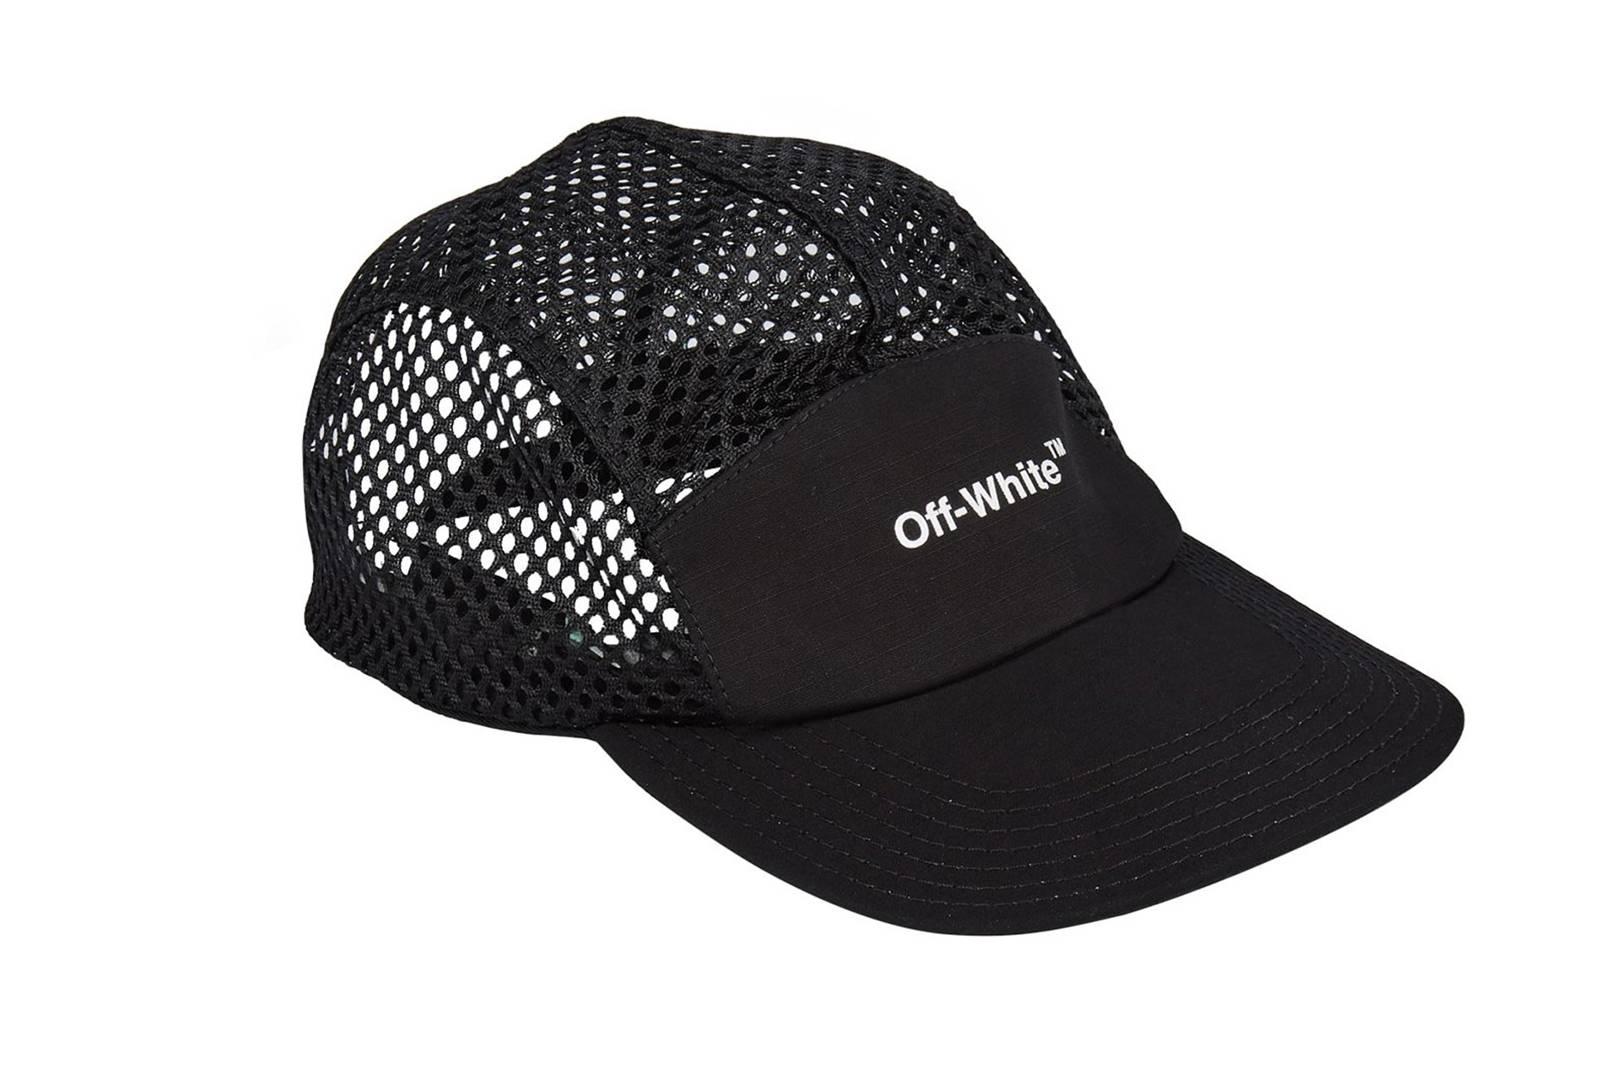 50681698 Best men's caps for the summer | British GQ